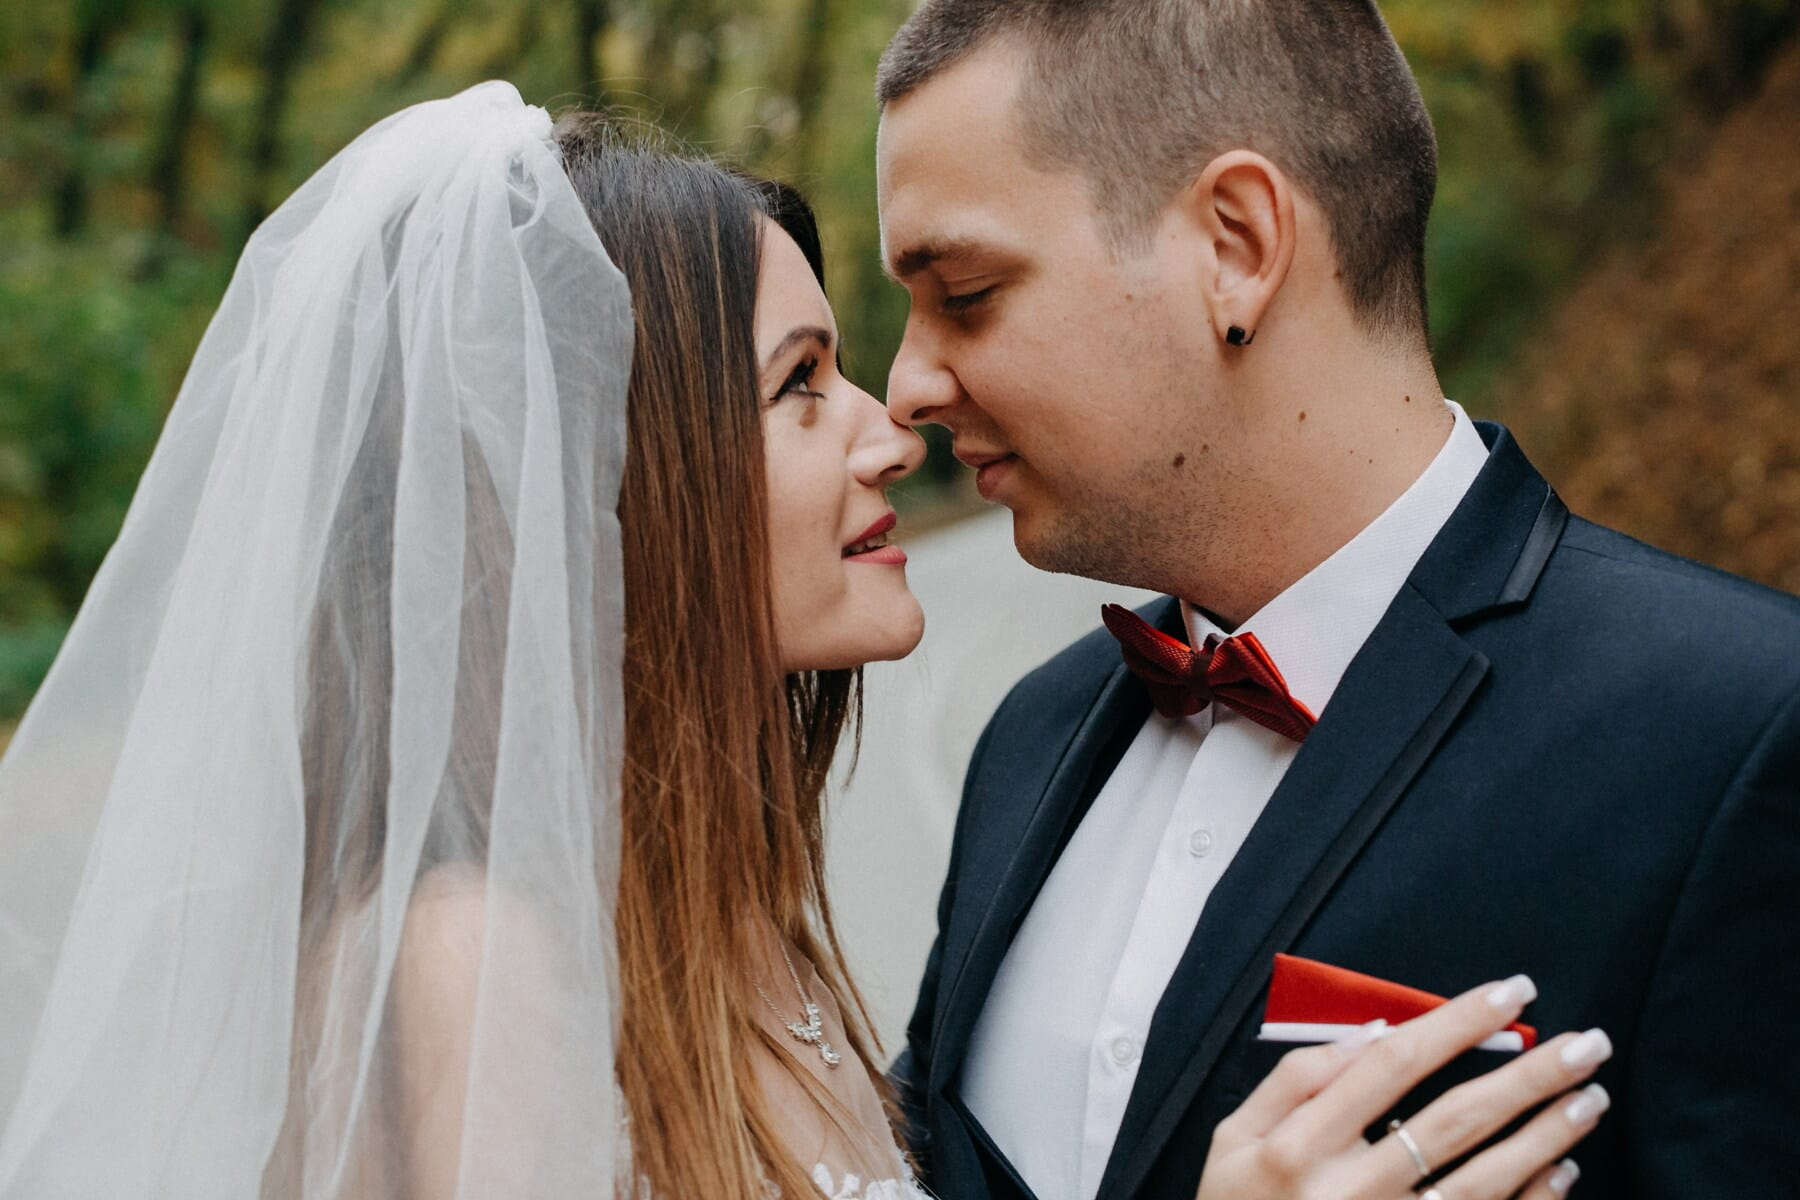 marriage, partners, just married, kiss, veil, bride, tenderness, suit, wedding, love